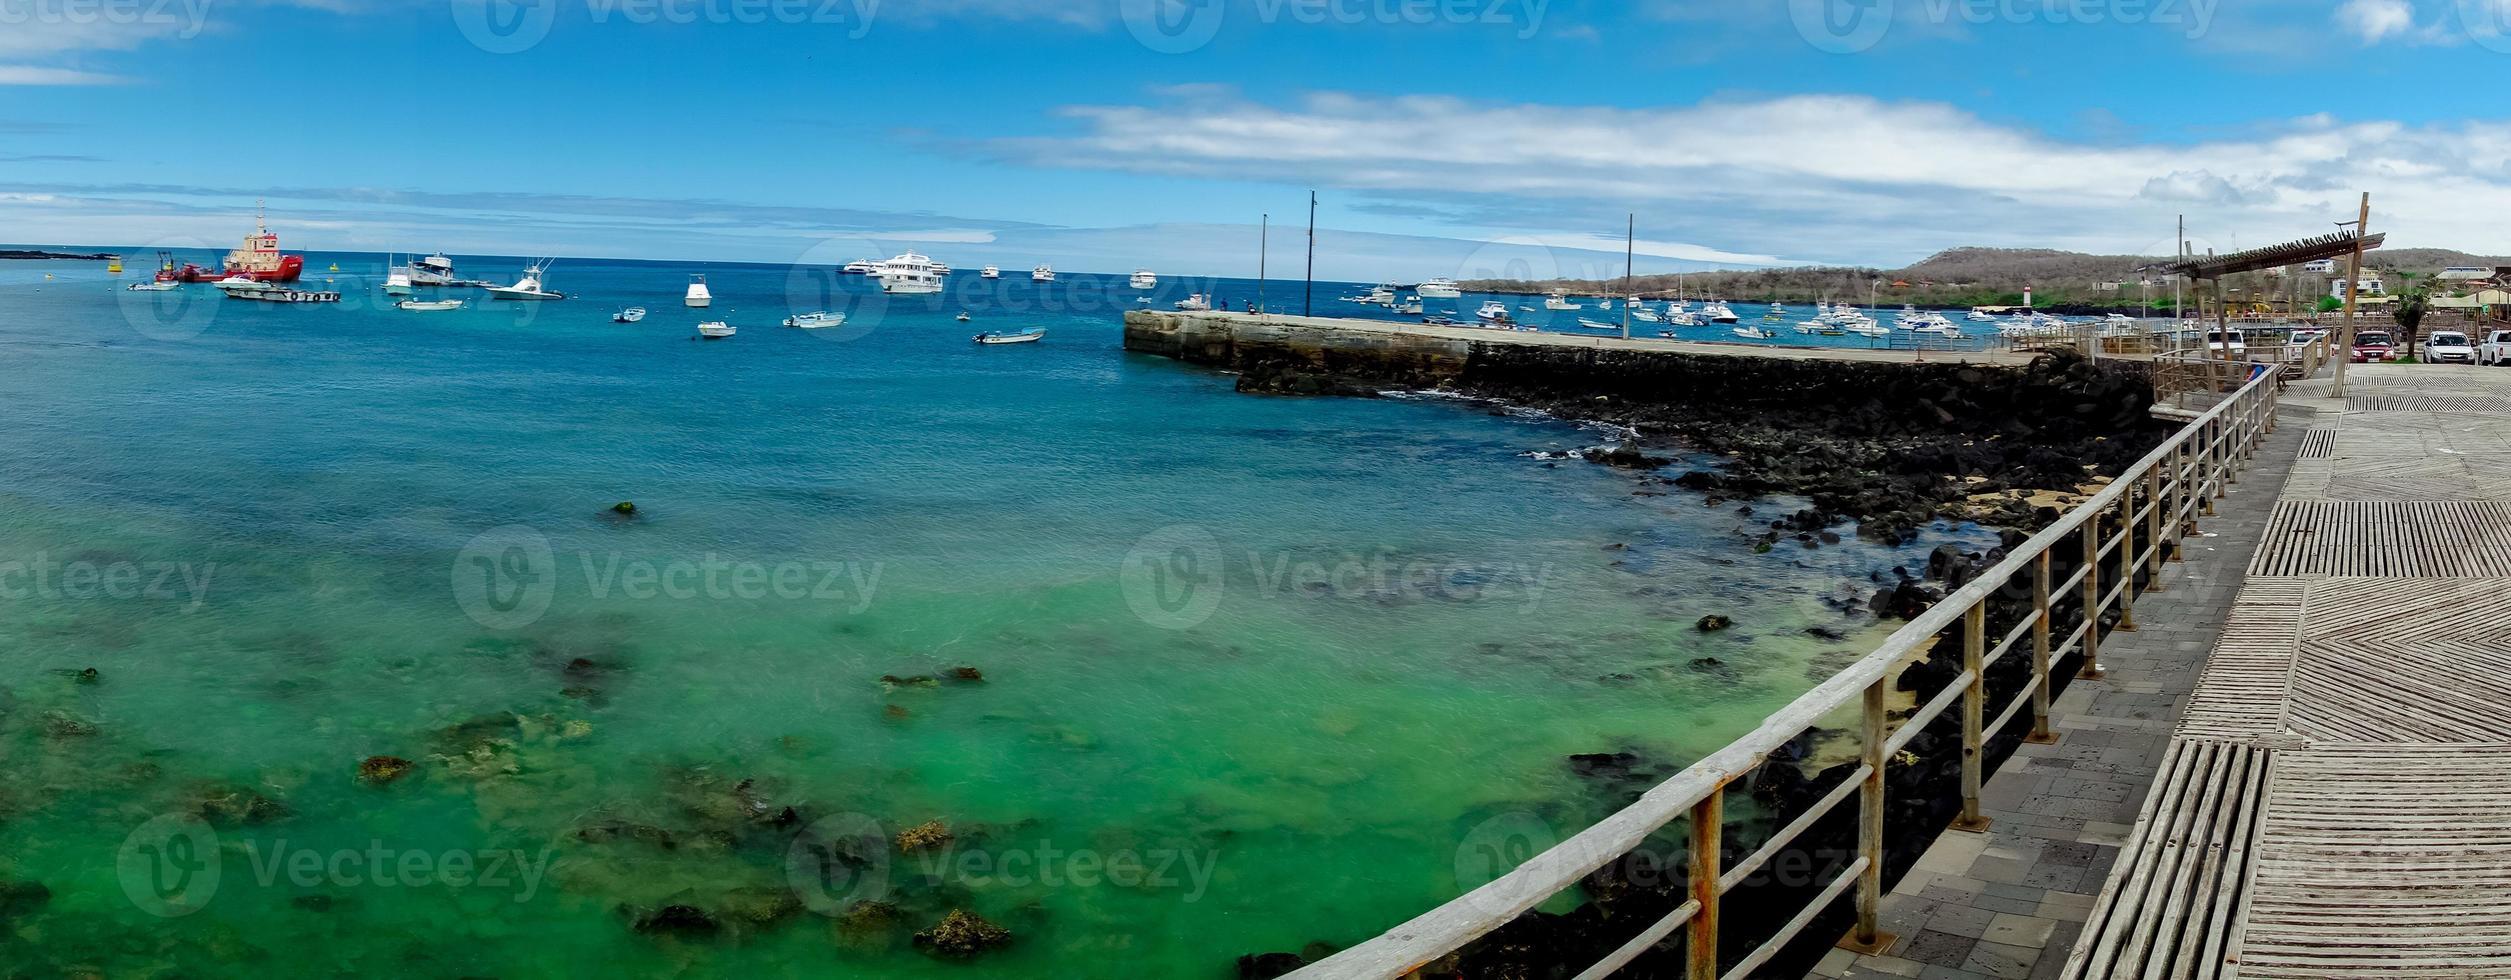 Yachthafen in San Cristobal Galapagos Inseln Ecuador foto